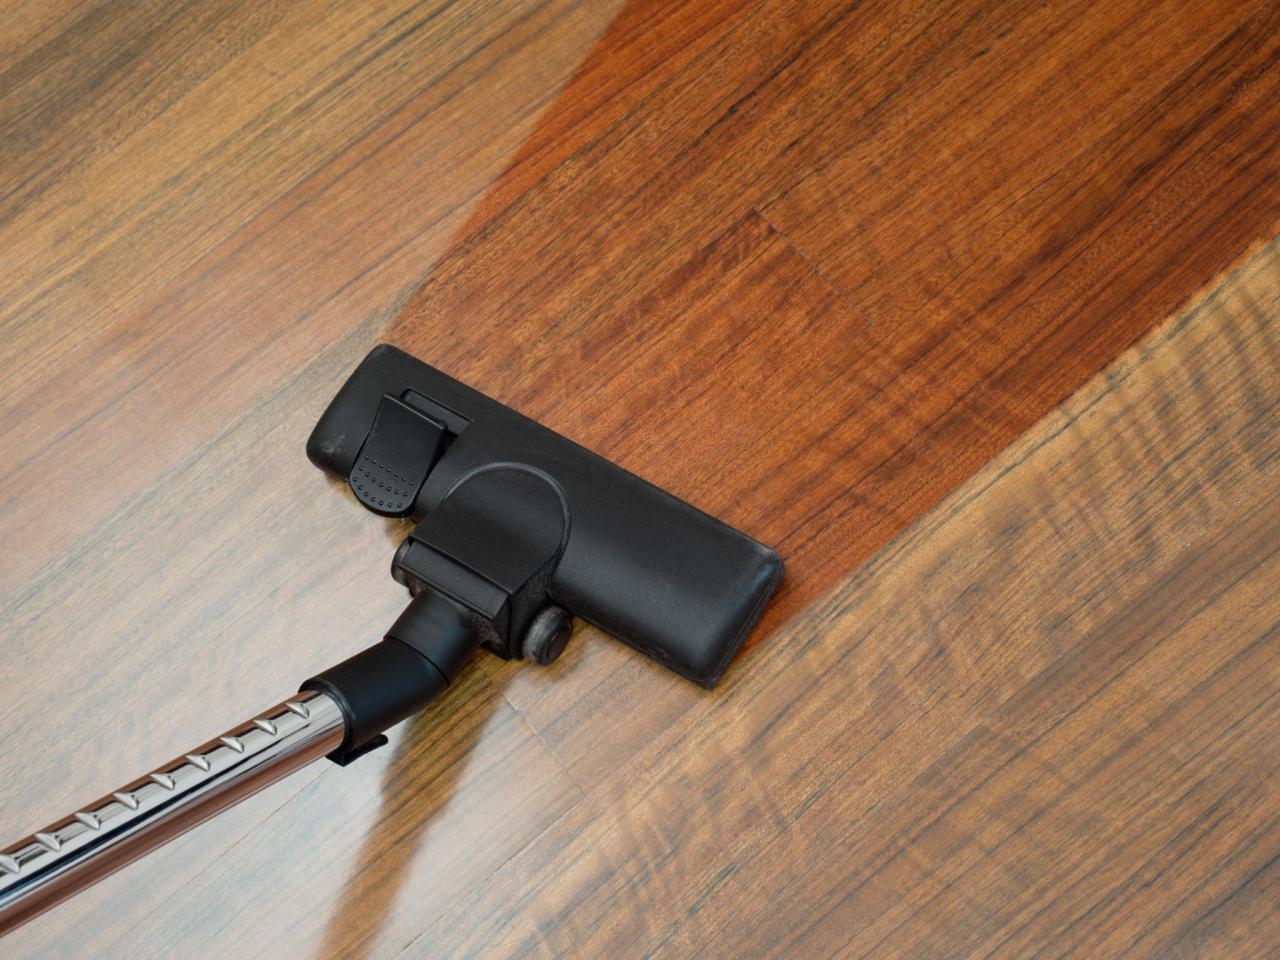 vacuuming wooden flooring